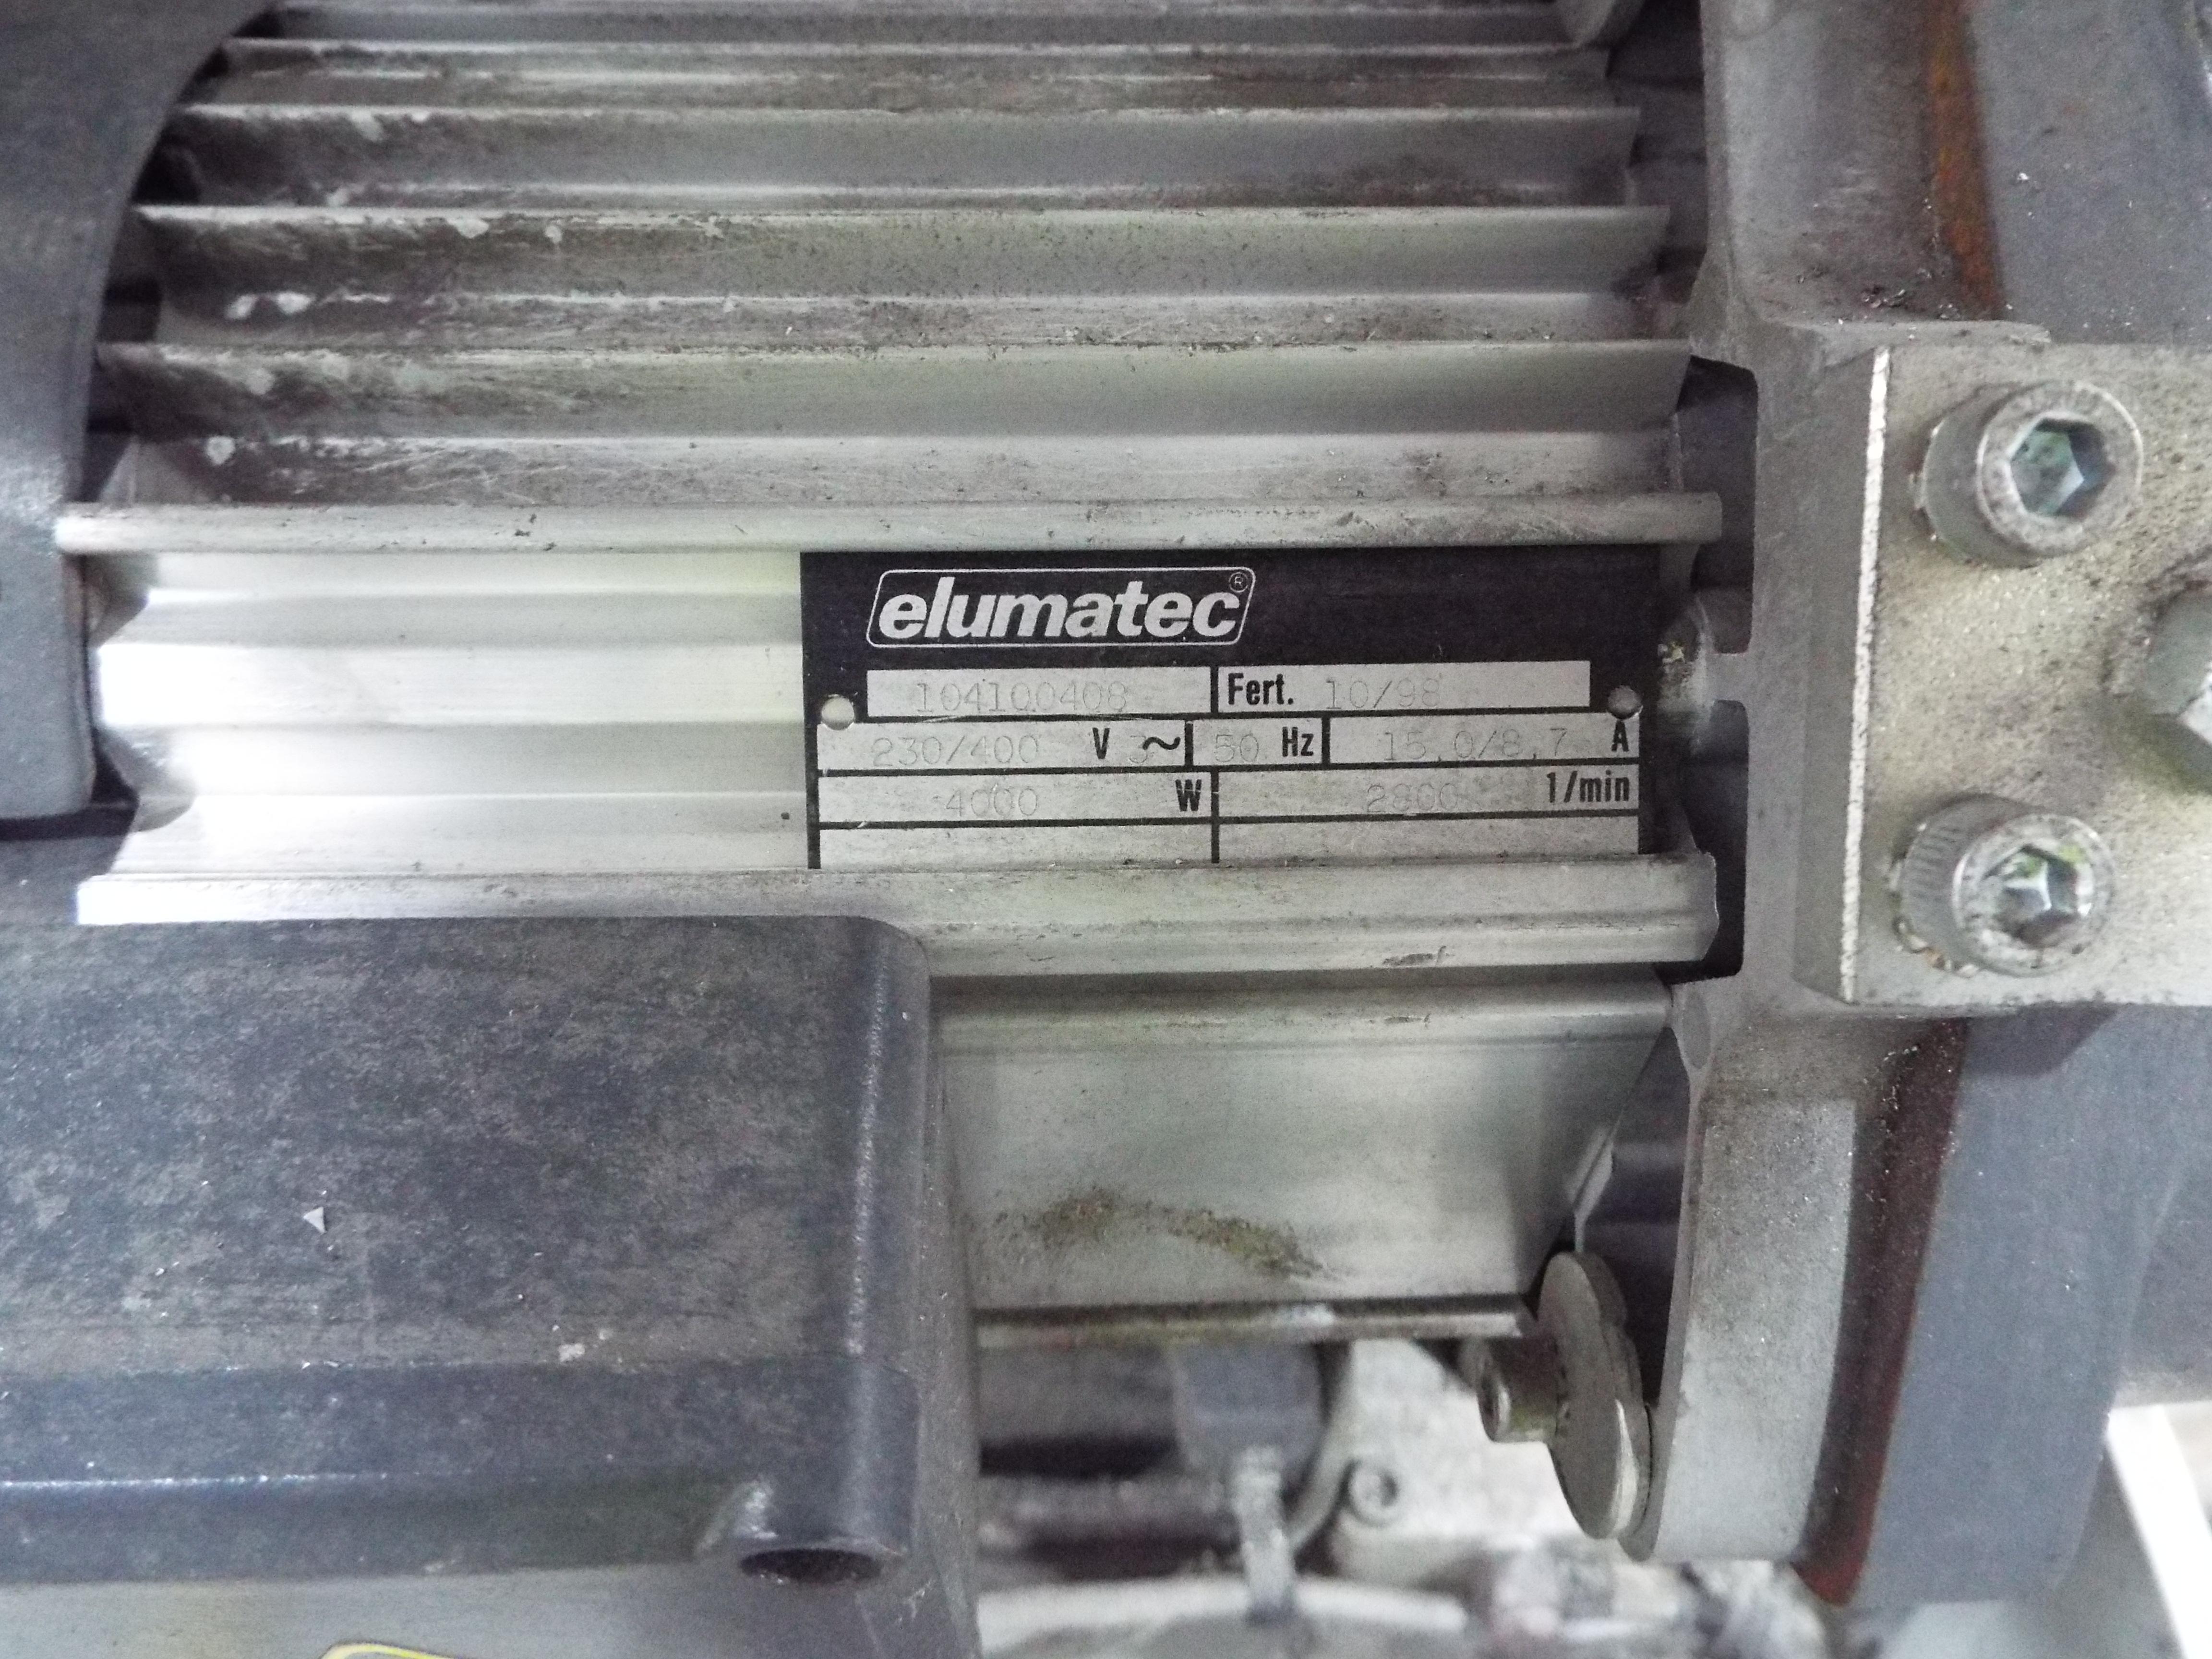 Lot 2 - Elumatec DG142